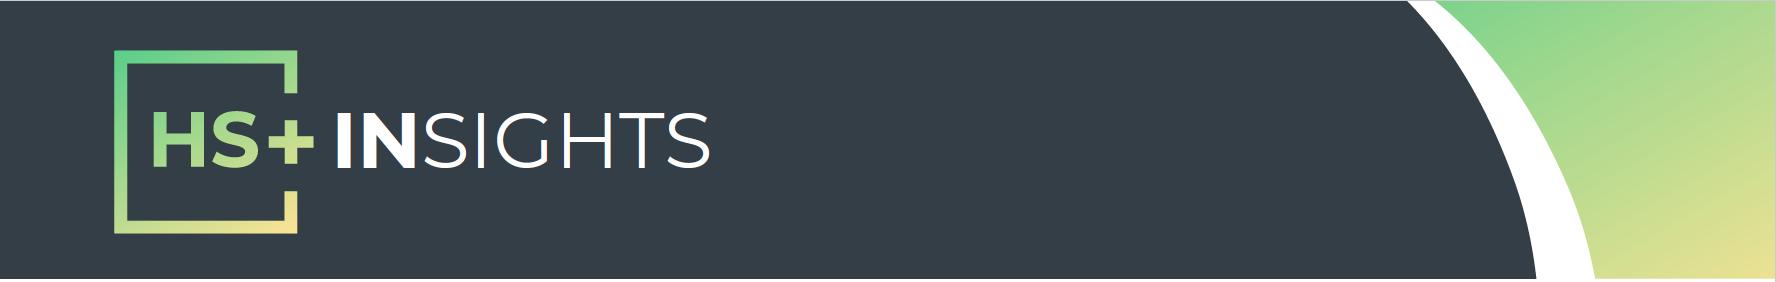 Hypersign Insights banner